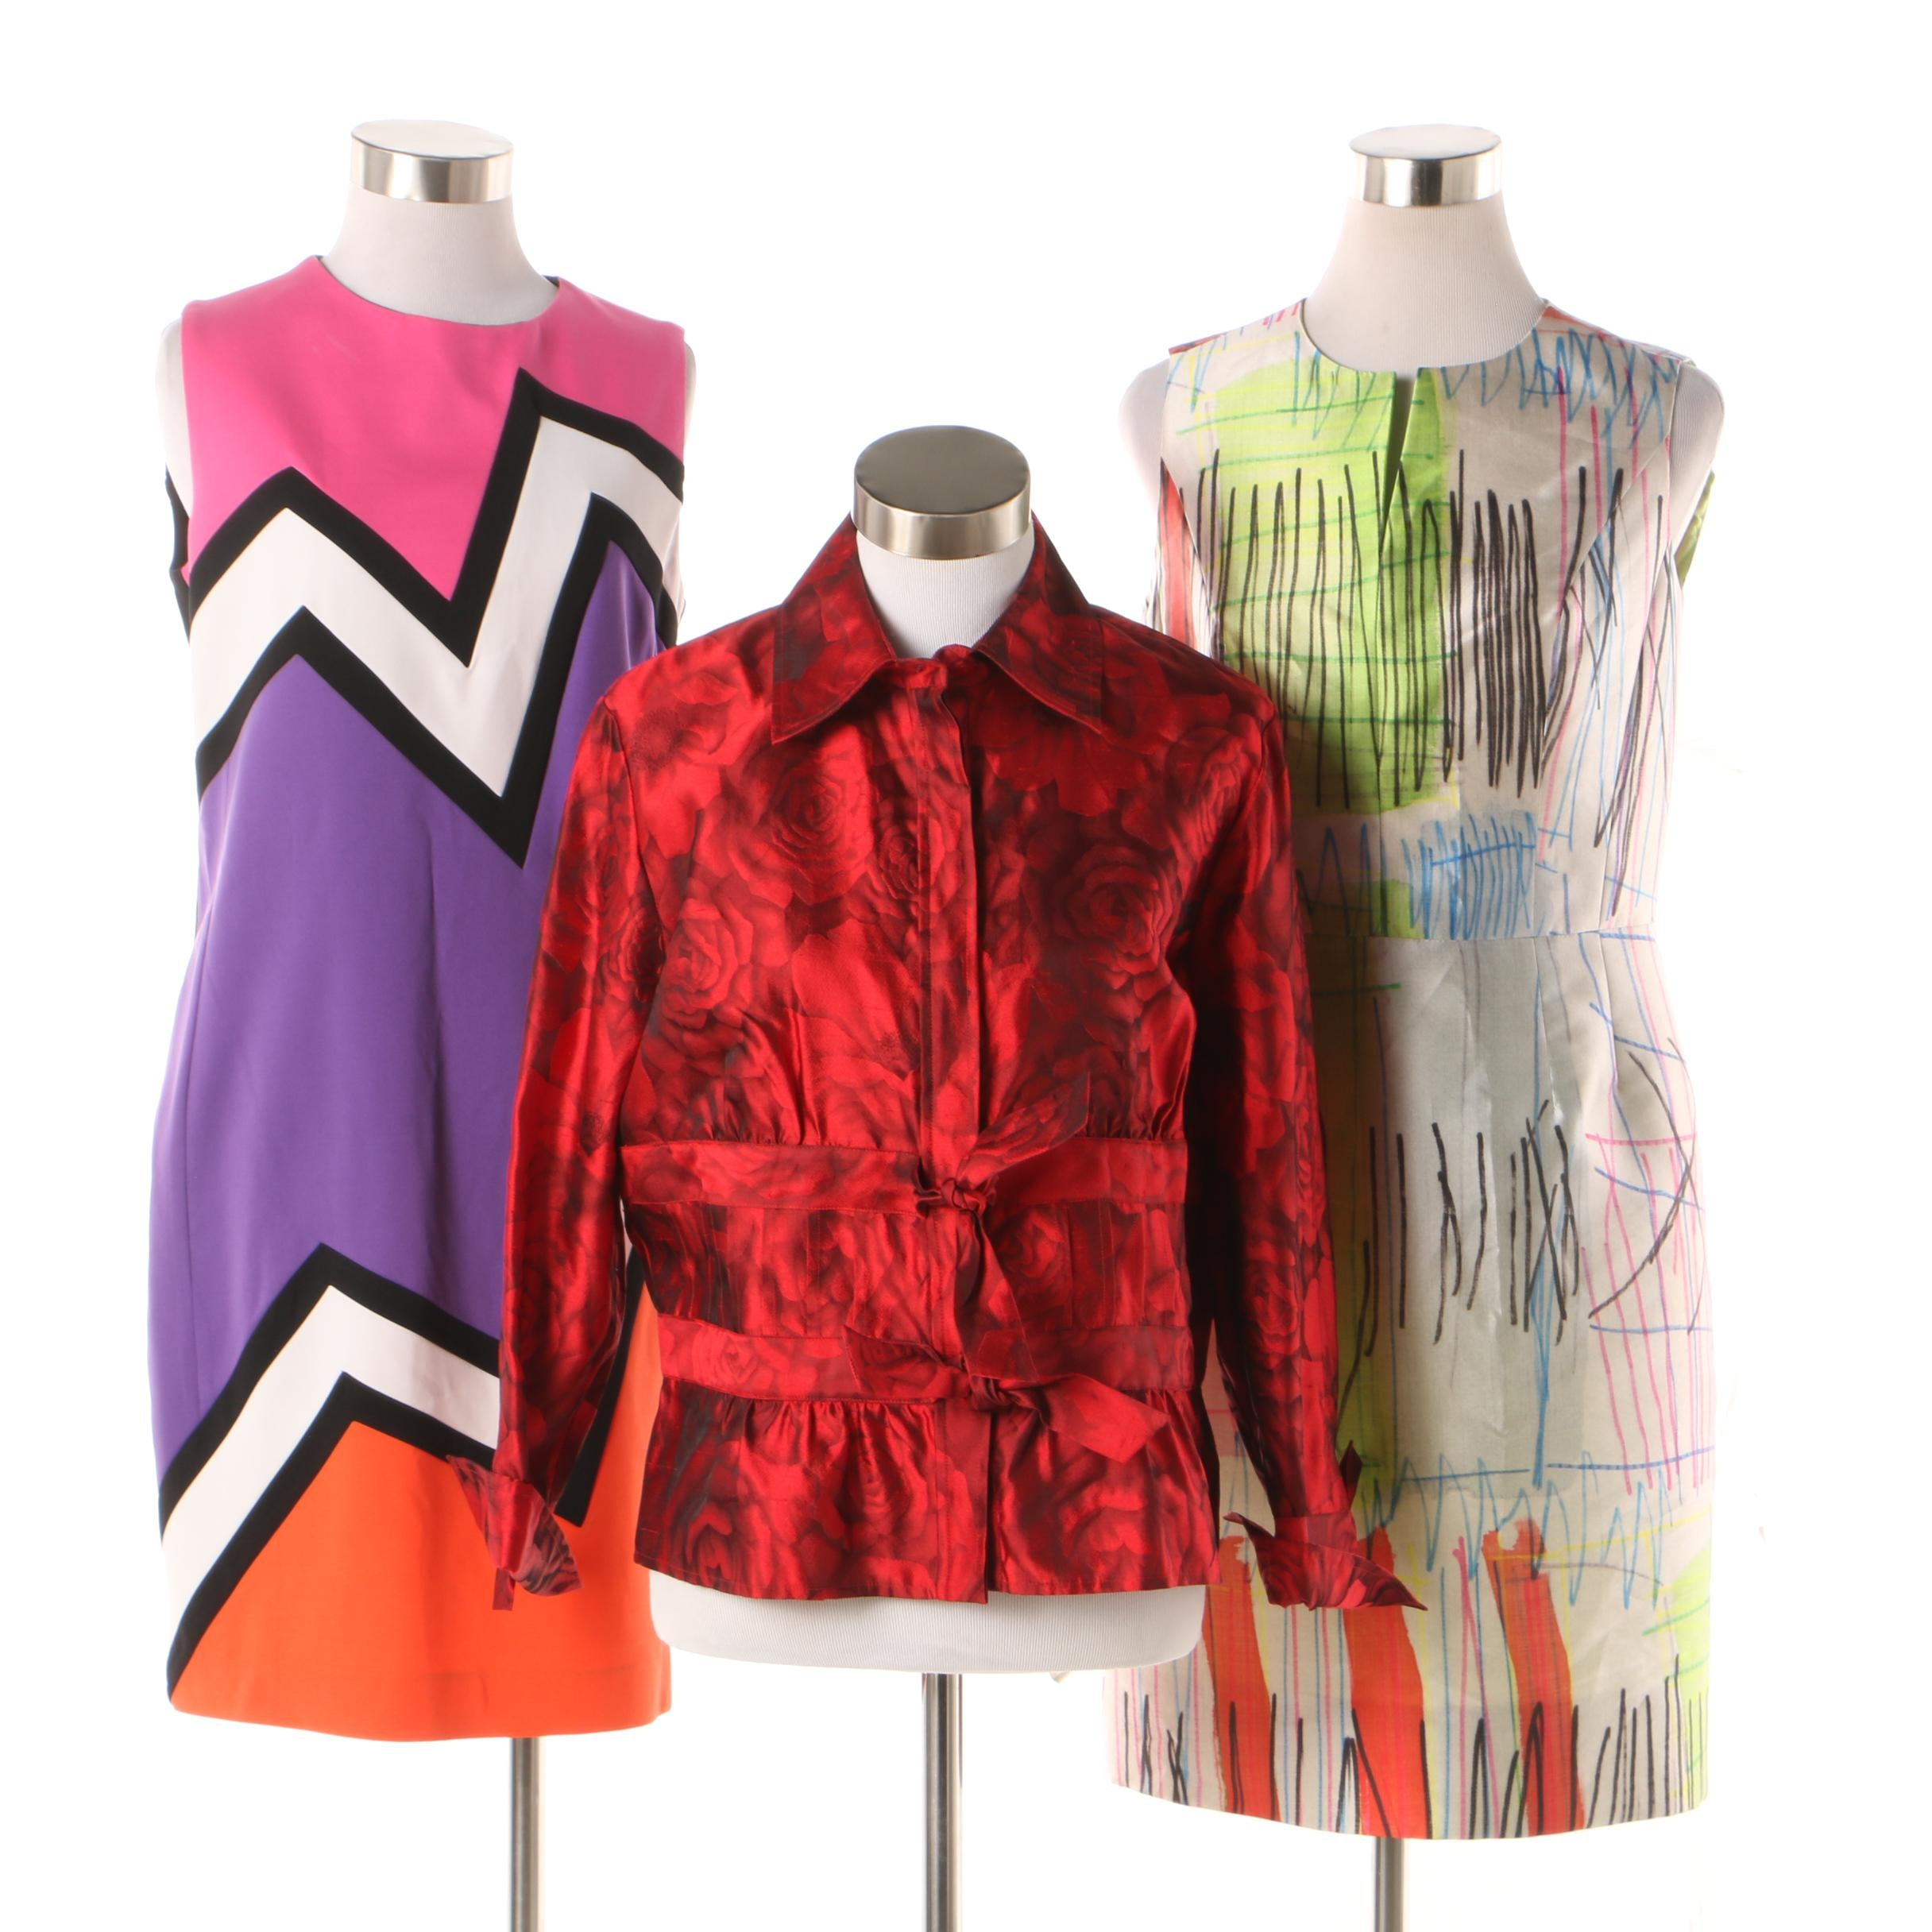 Abstract Print Sleeveless Designer Dresses and Carlisle Rose Print Blouse